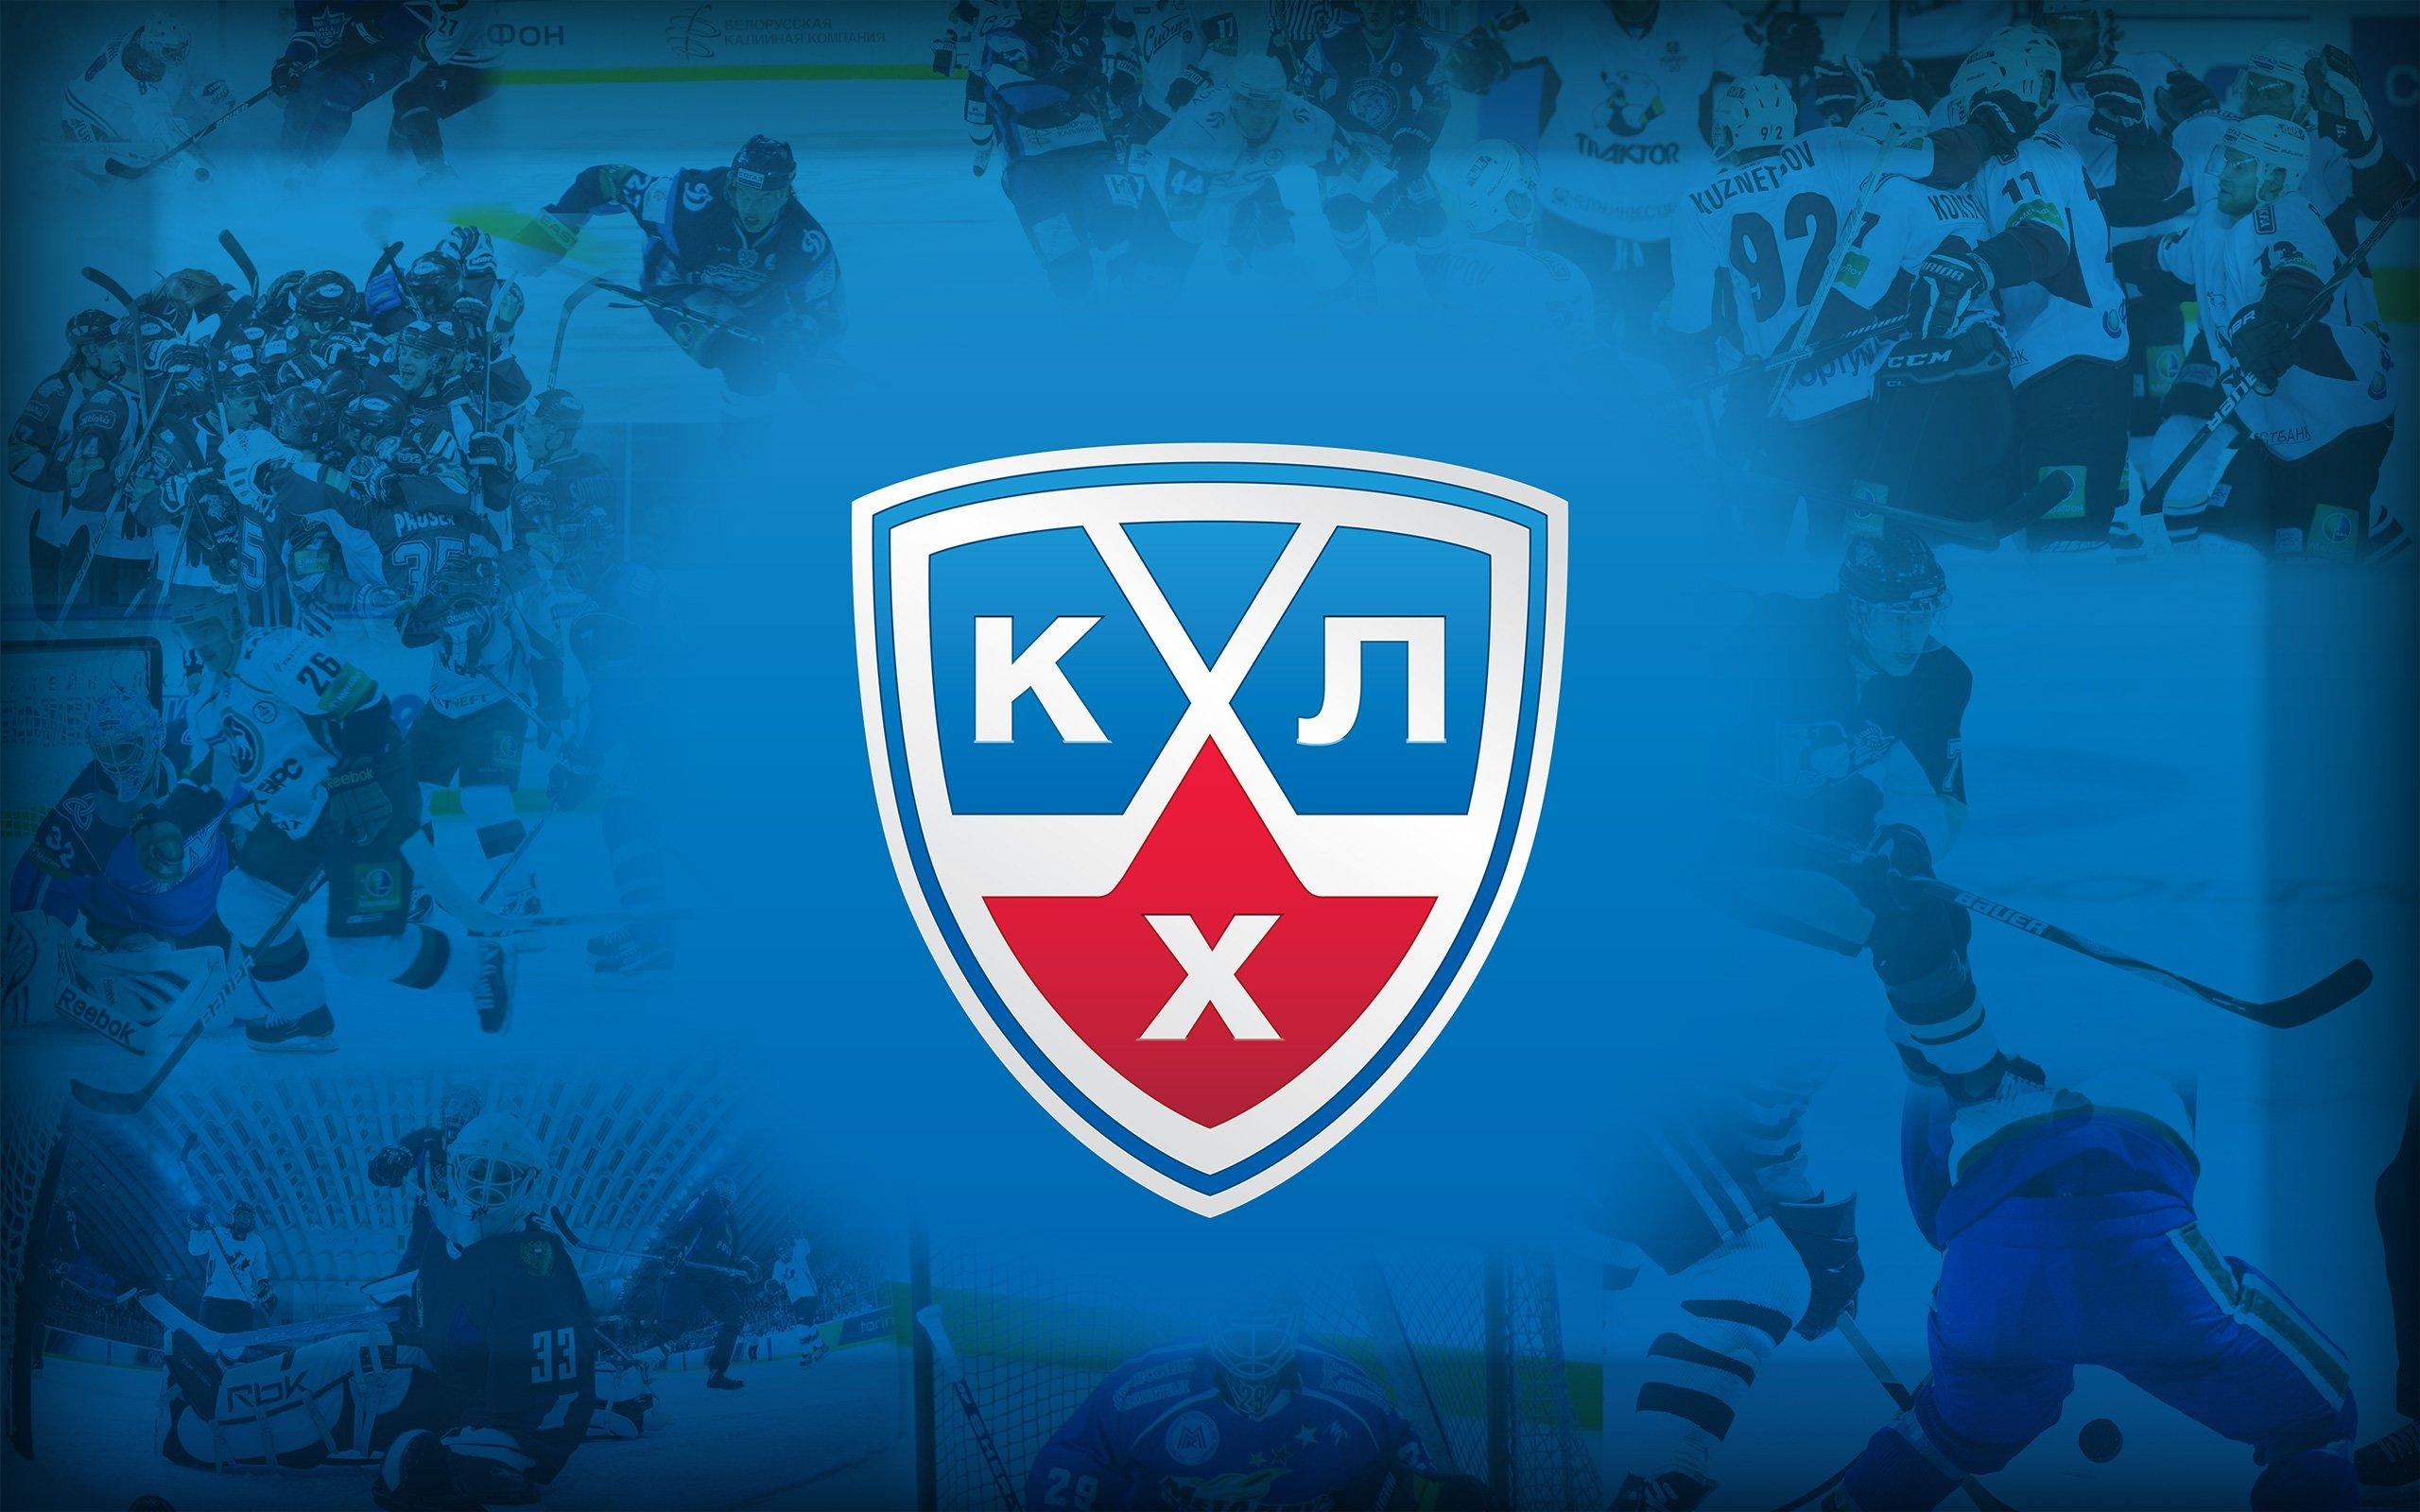 Прогноз на КХЛ: Трактор – Металлург Магнитогорск – 11 сентября 2018 года